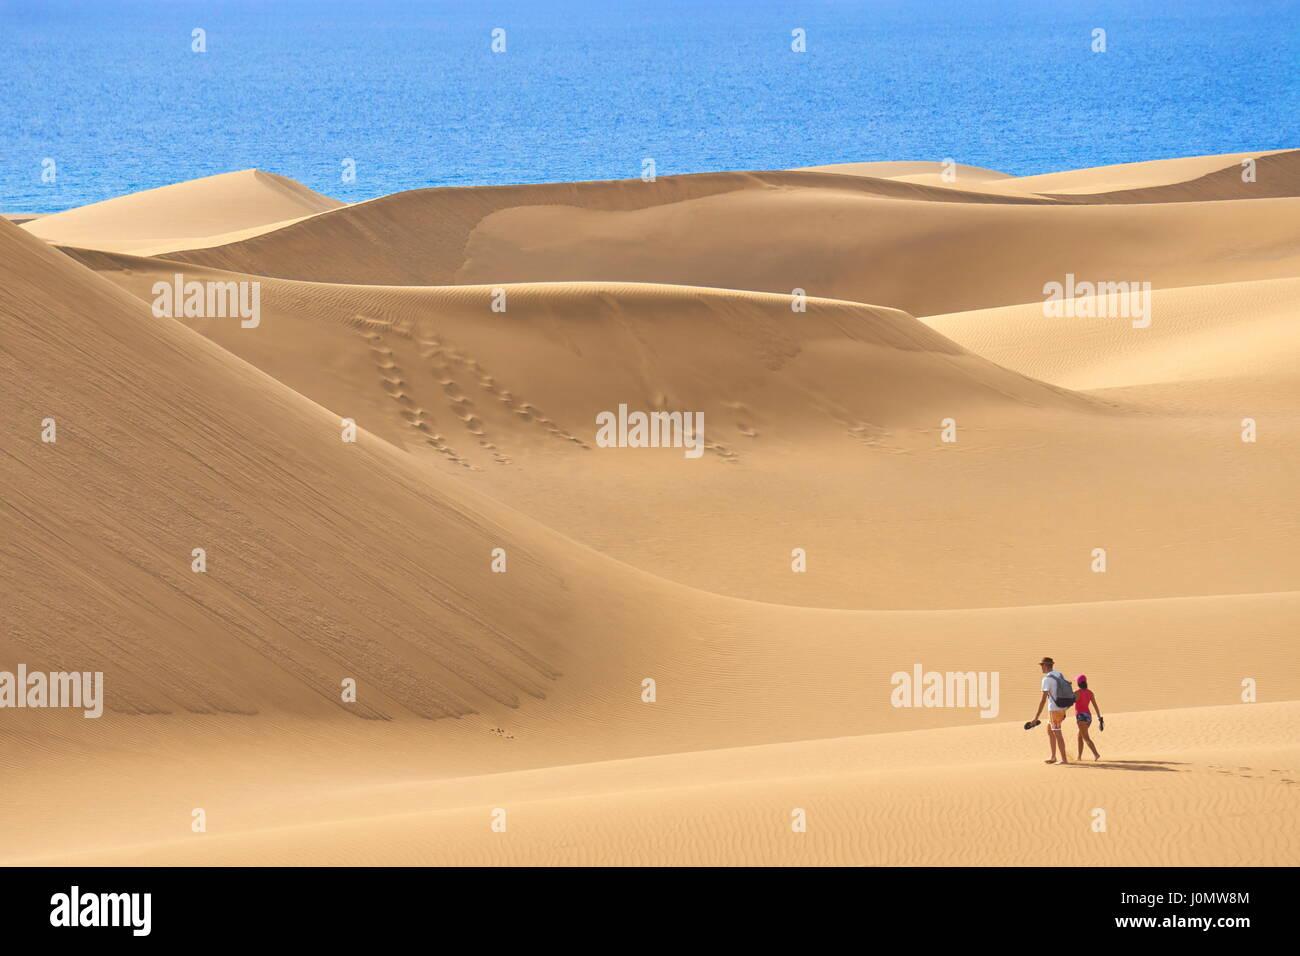 Touristen am Maspalomas Sand Dunes National Park, Gran Canaria, SpanienStockfoto